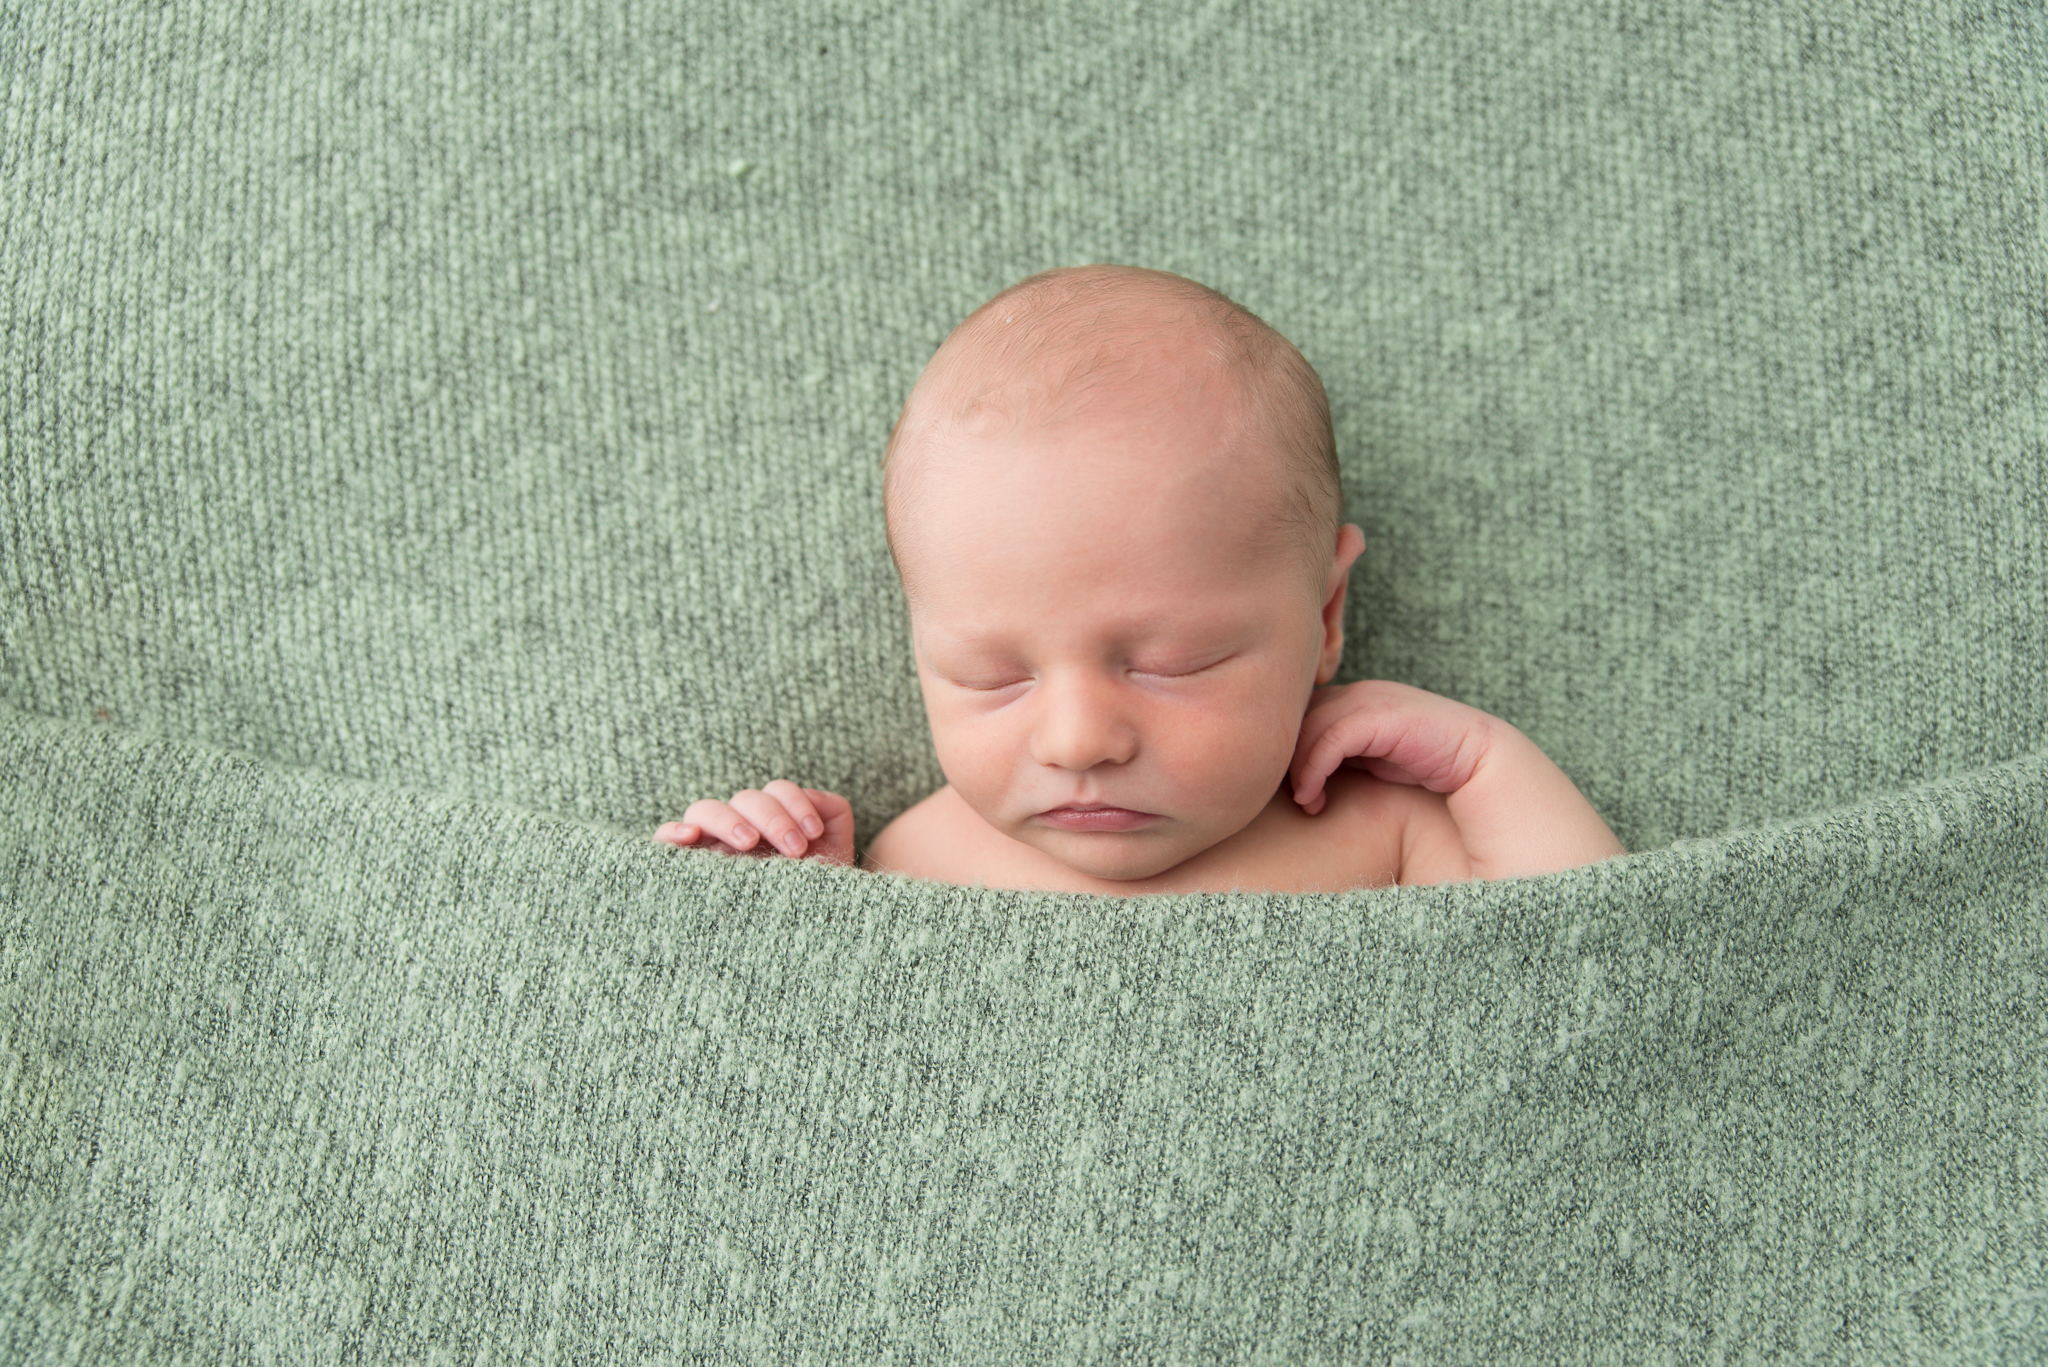 Chevy-chase-md-newborn-photographer65.jpg